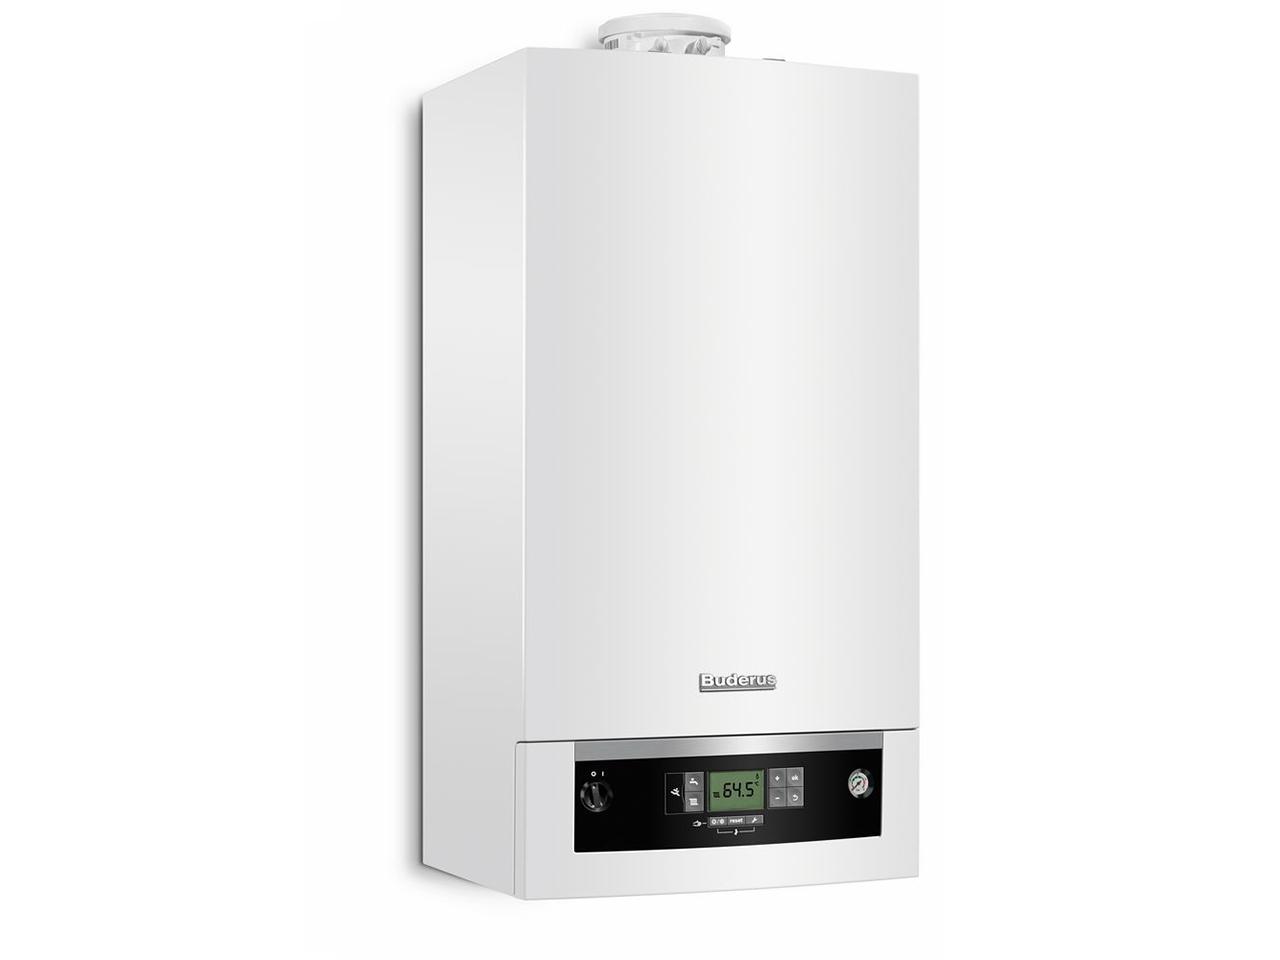 Gas boiler Buderus Logamax U072-24K: reviews, specs, instruction manual